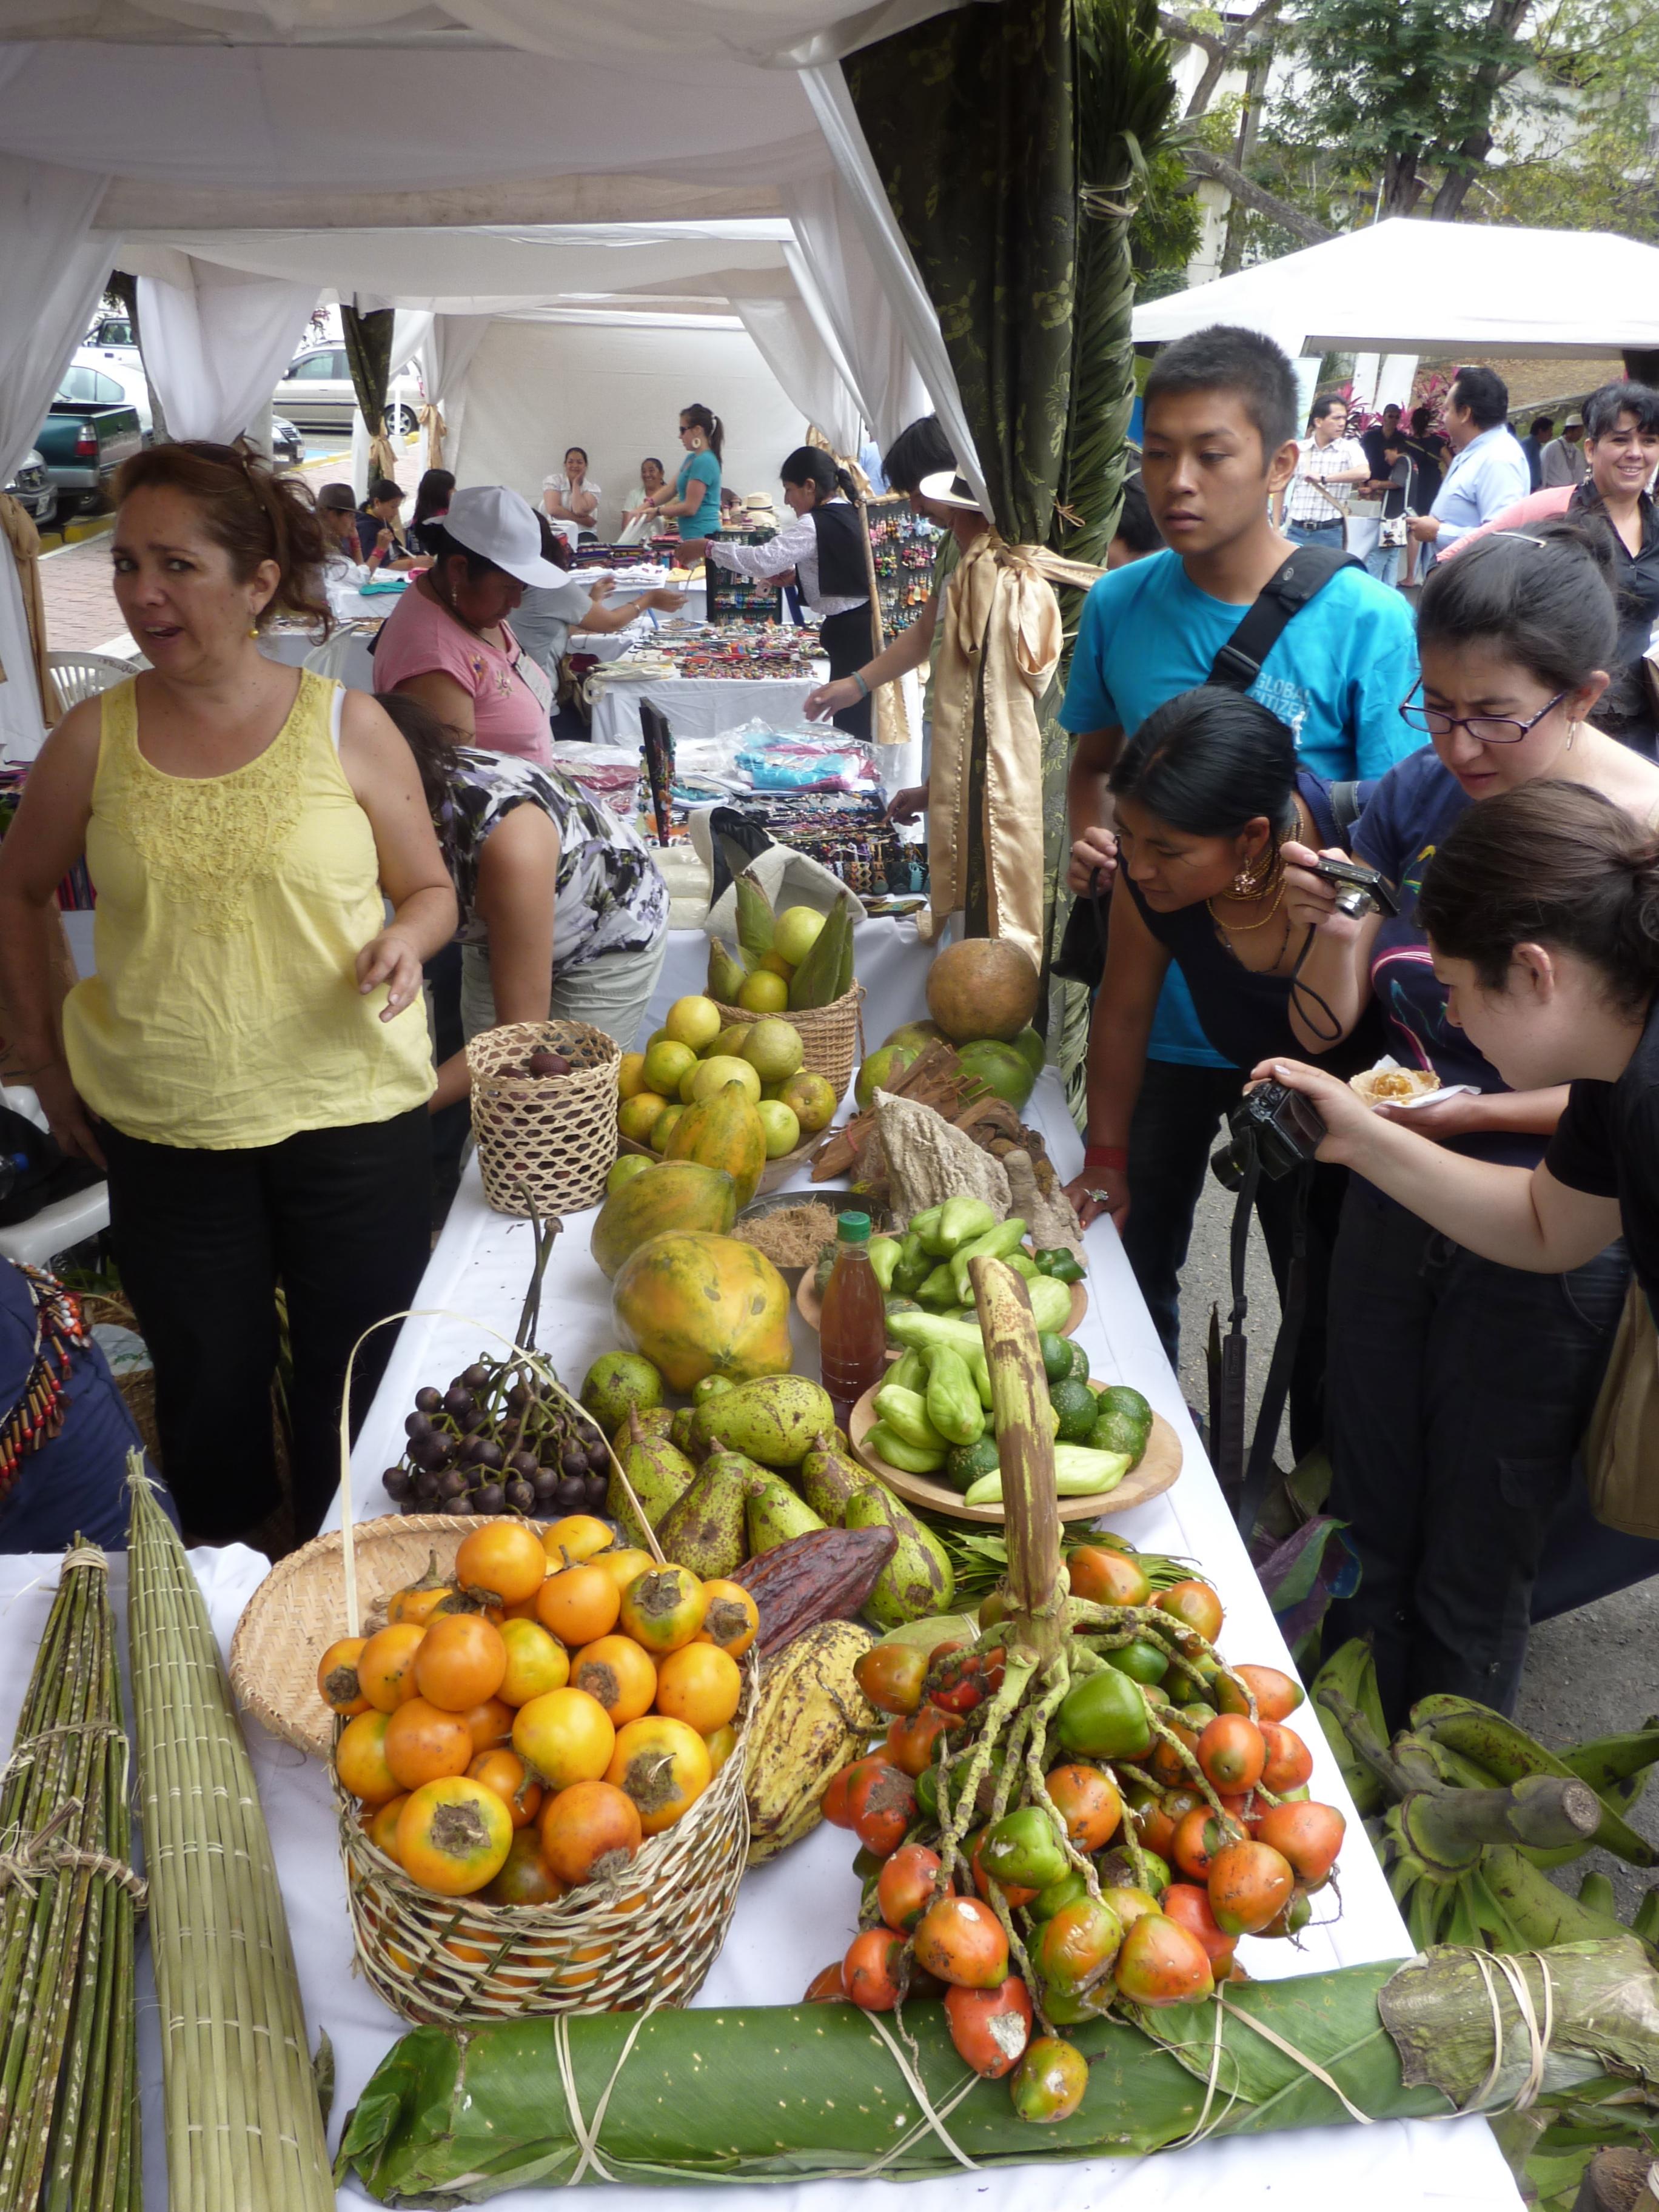 Market of organic goods